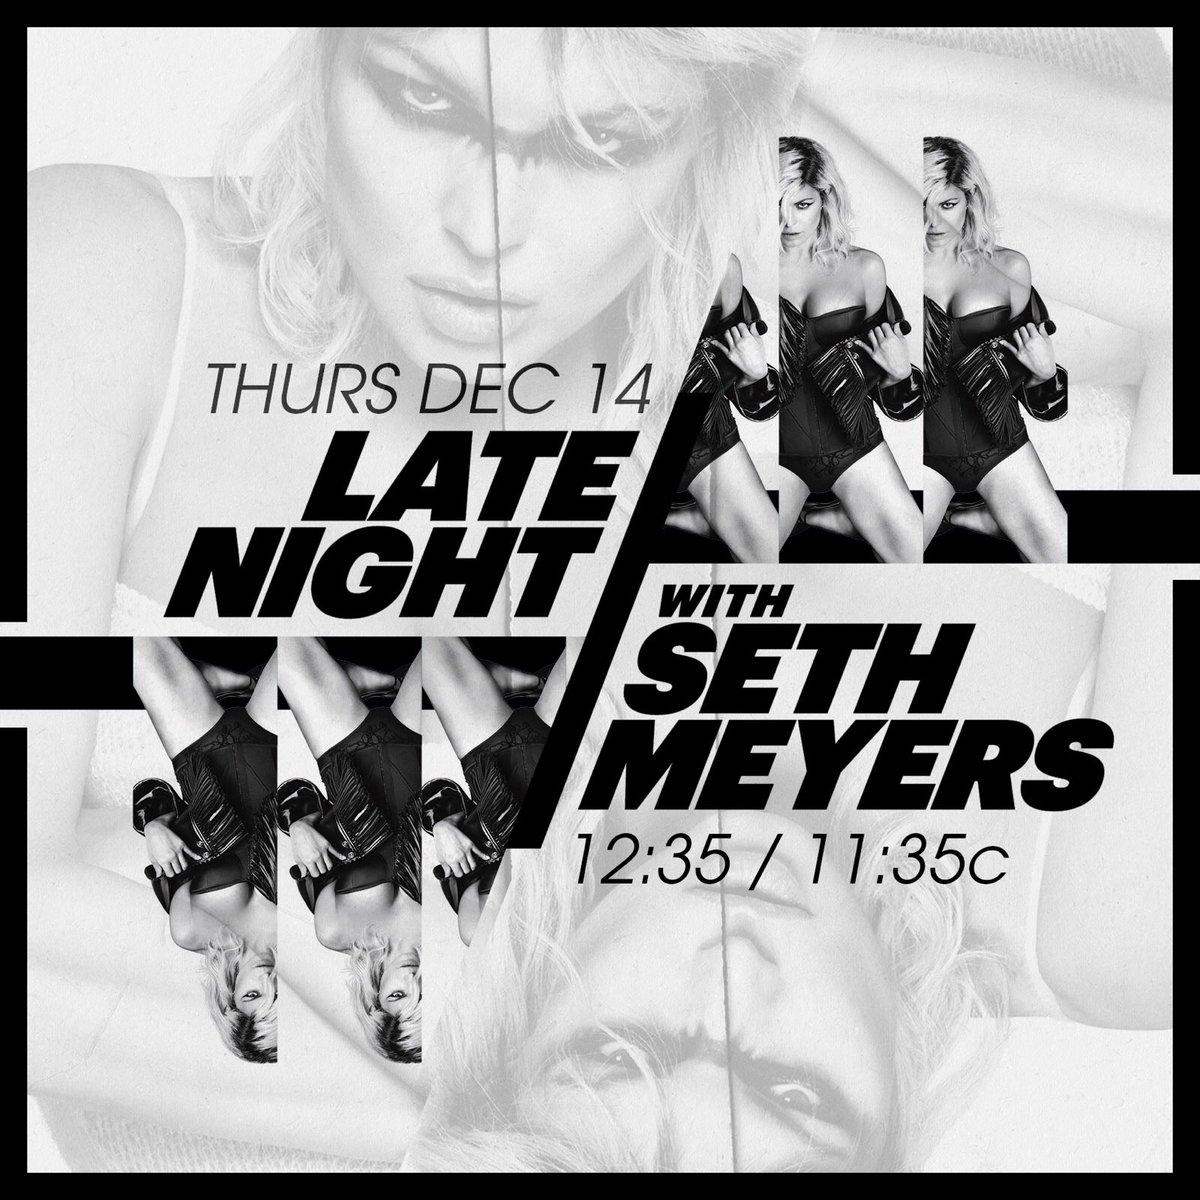 tonight! @LateNightSeth https://t.co/CacGAdybWN